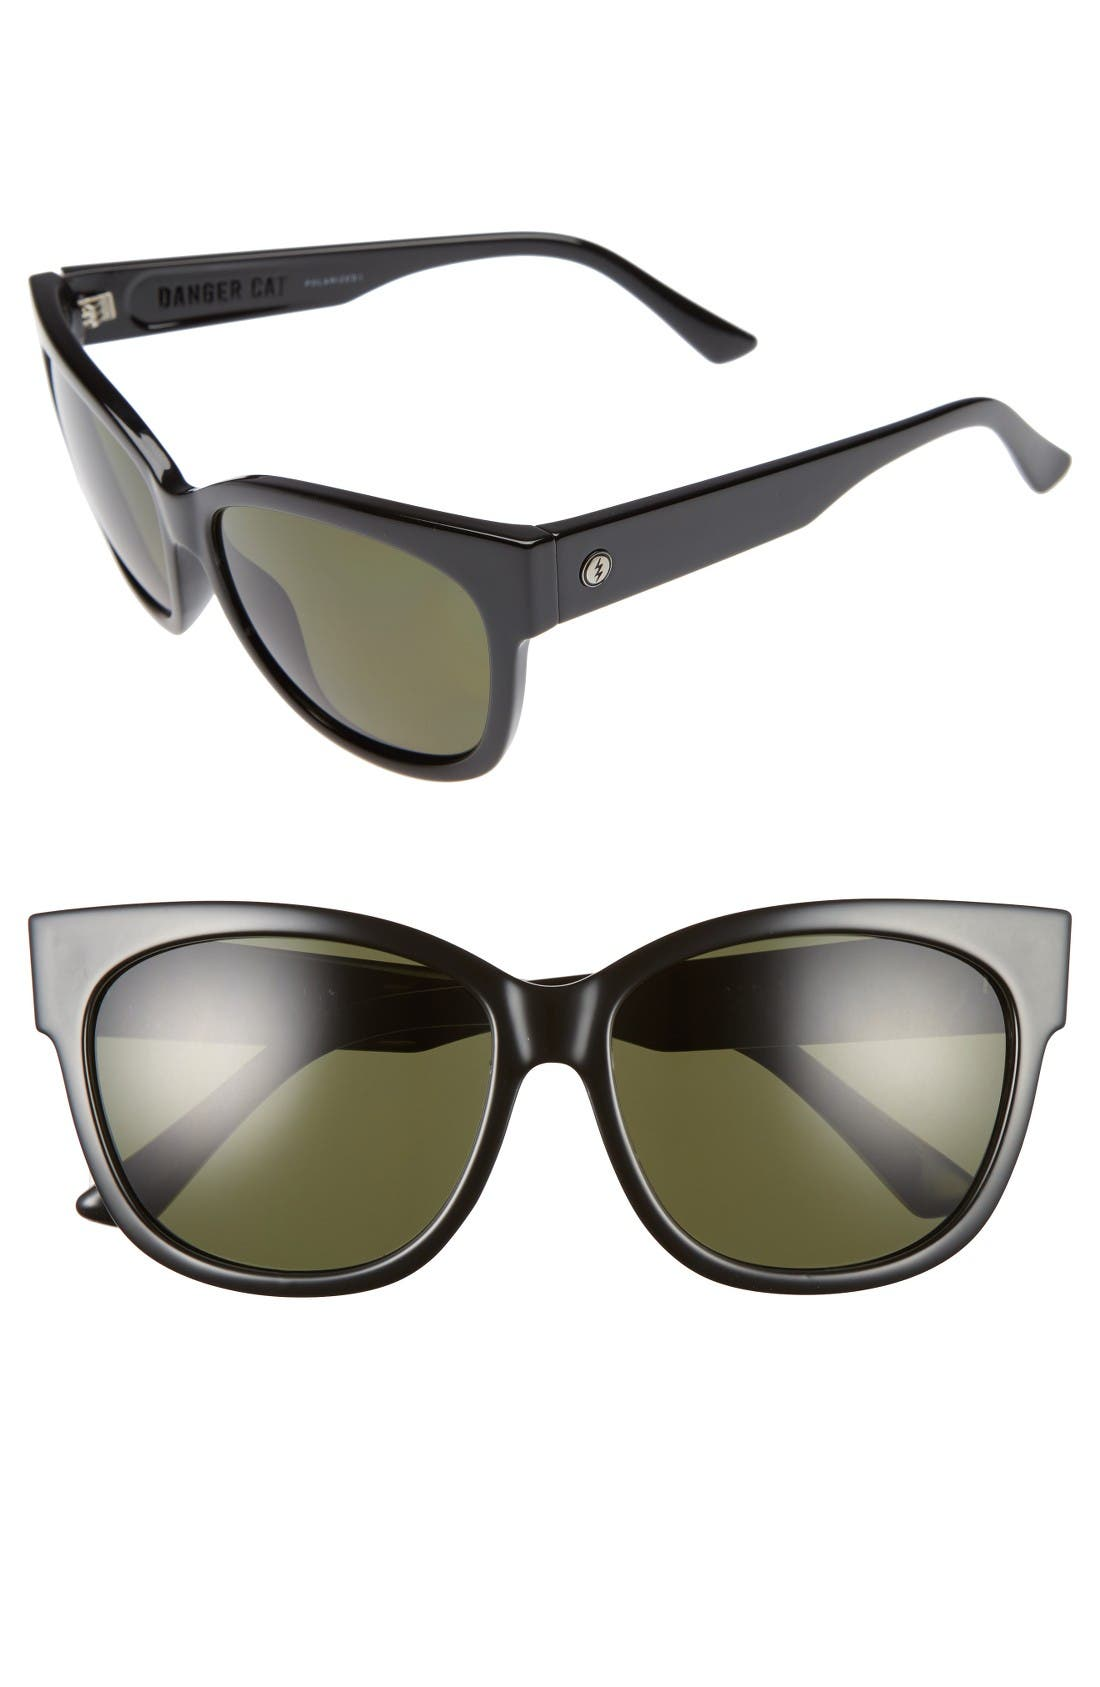 Danger Cat 58mm Sunglasses,                             Main thumbnail 1, color,                             Gloss Black/ Polarized Grey